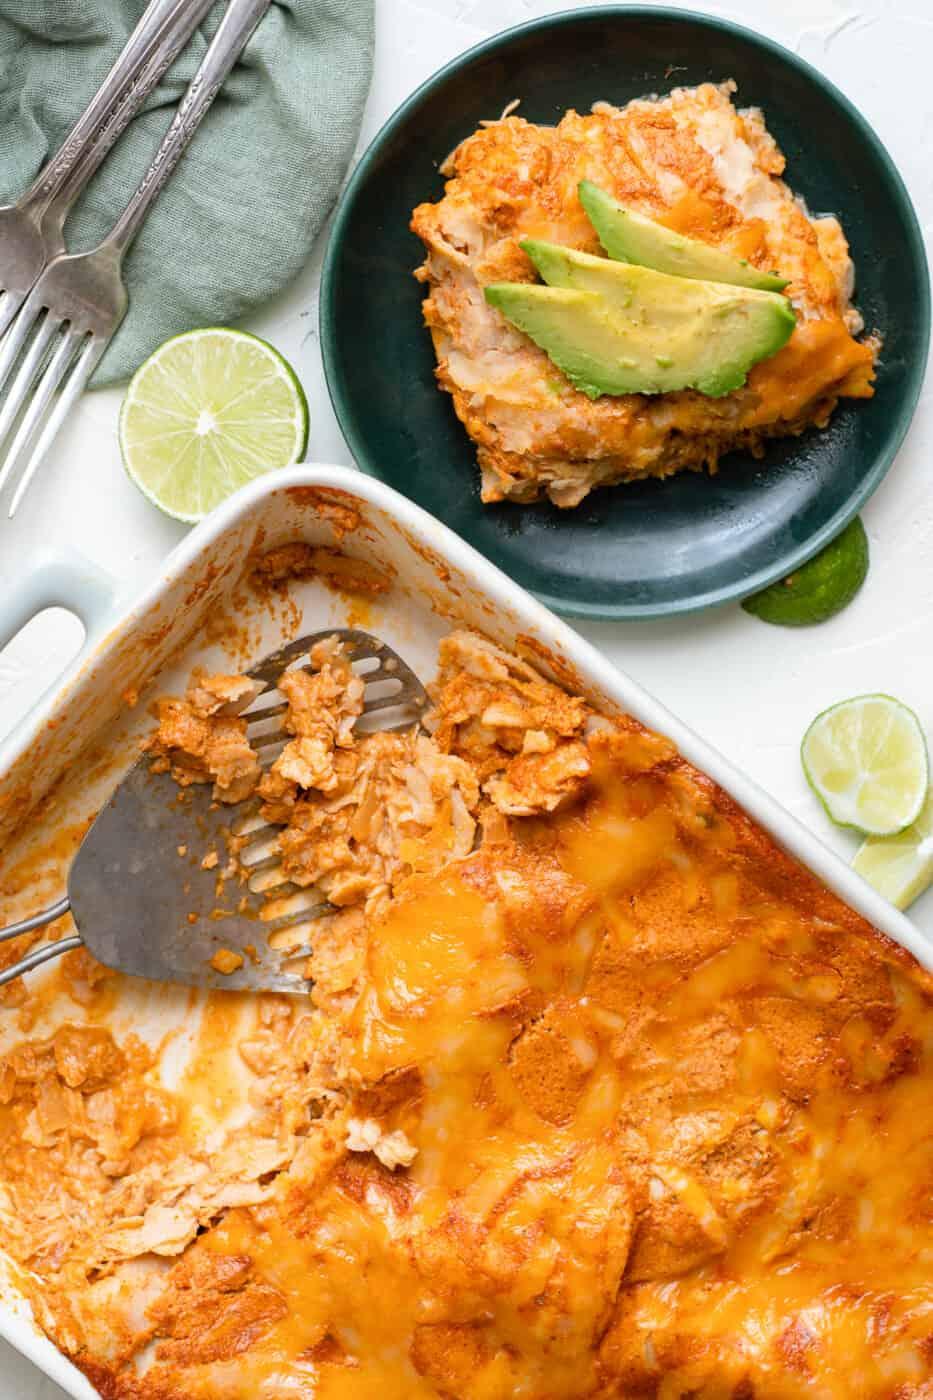 pan of chicken enchilada casserole next to plate